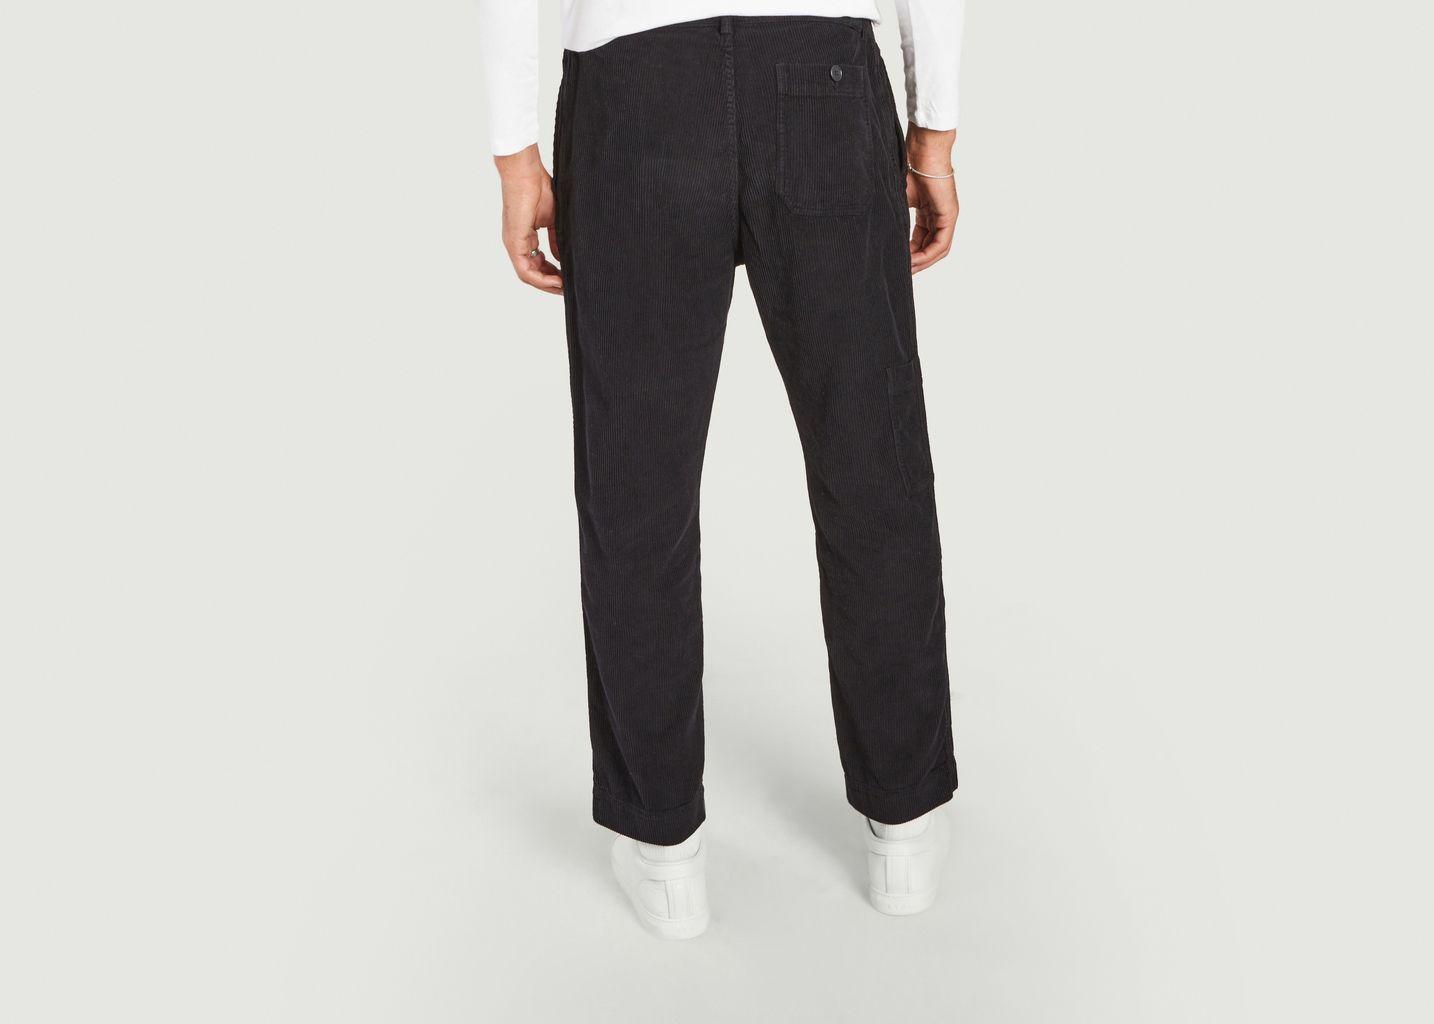 Pantalon en velours côtelé Aberlour - KESTIN